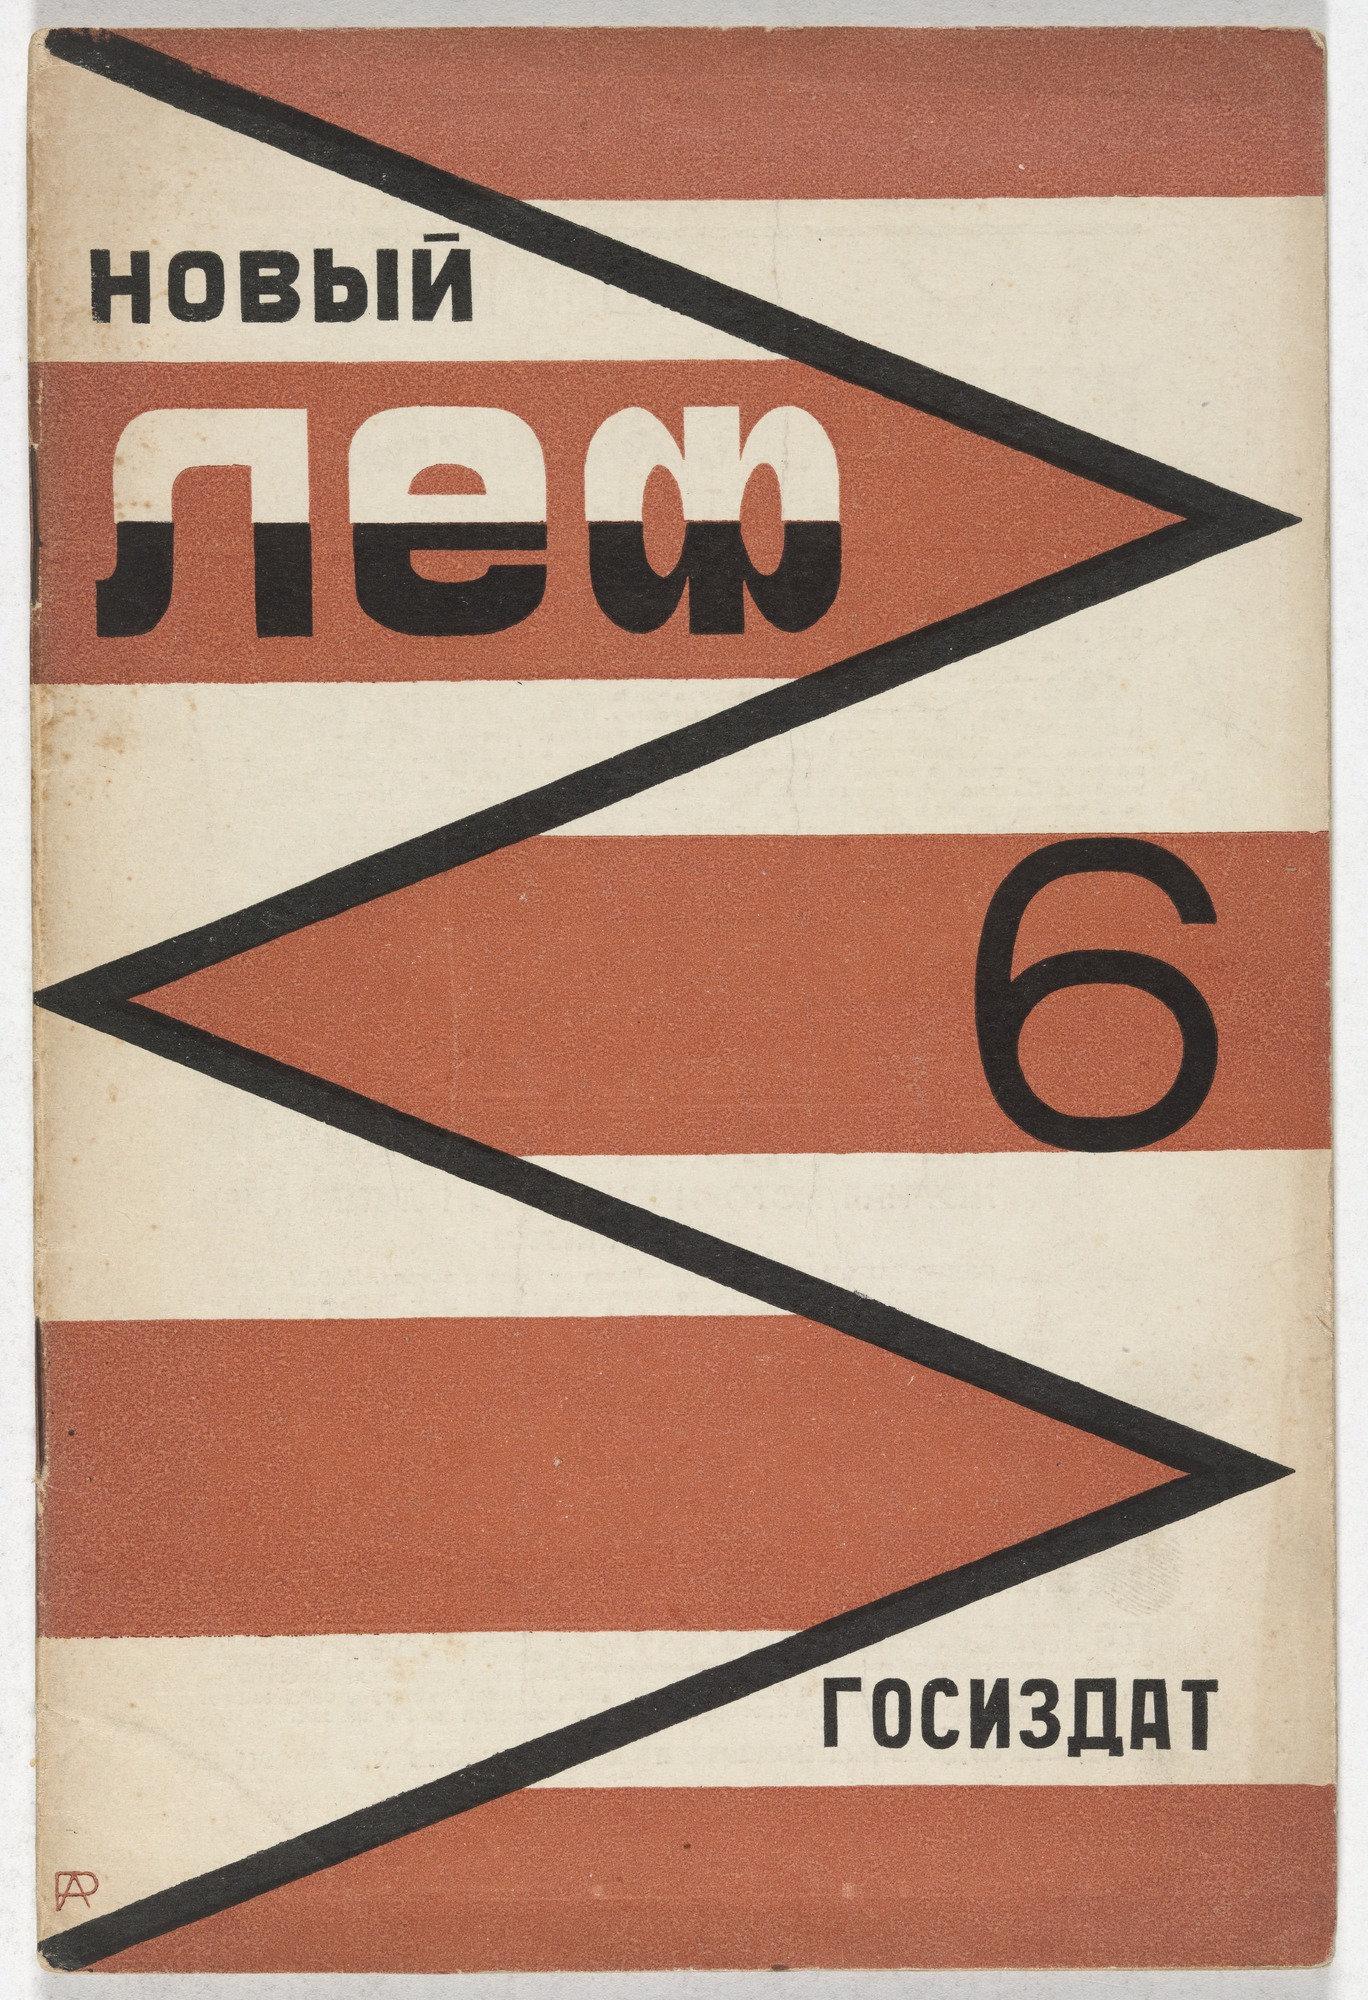 Aleksandr Rodchenko,Novyi LEF. Zhurnal levogo fronta iskusstv (New LEF: Journal of the Left Front of the Arts), no. 6,1928